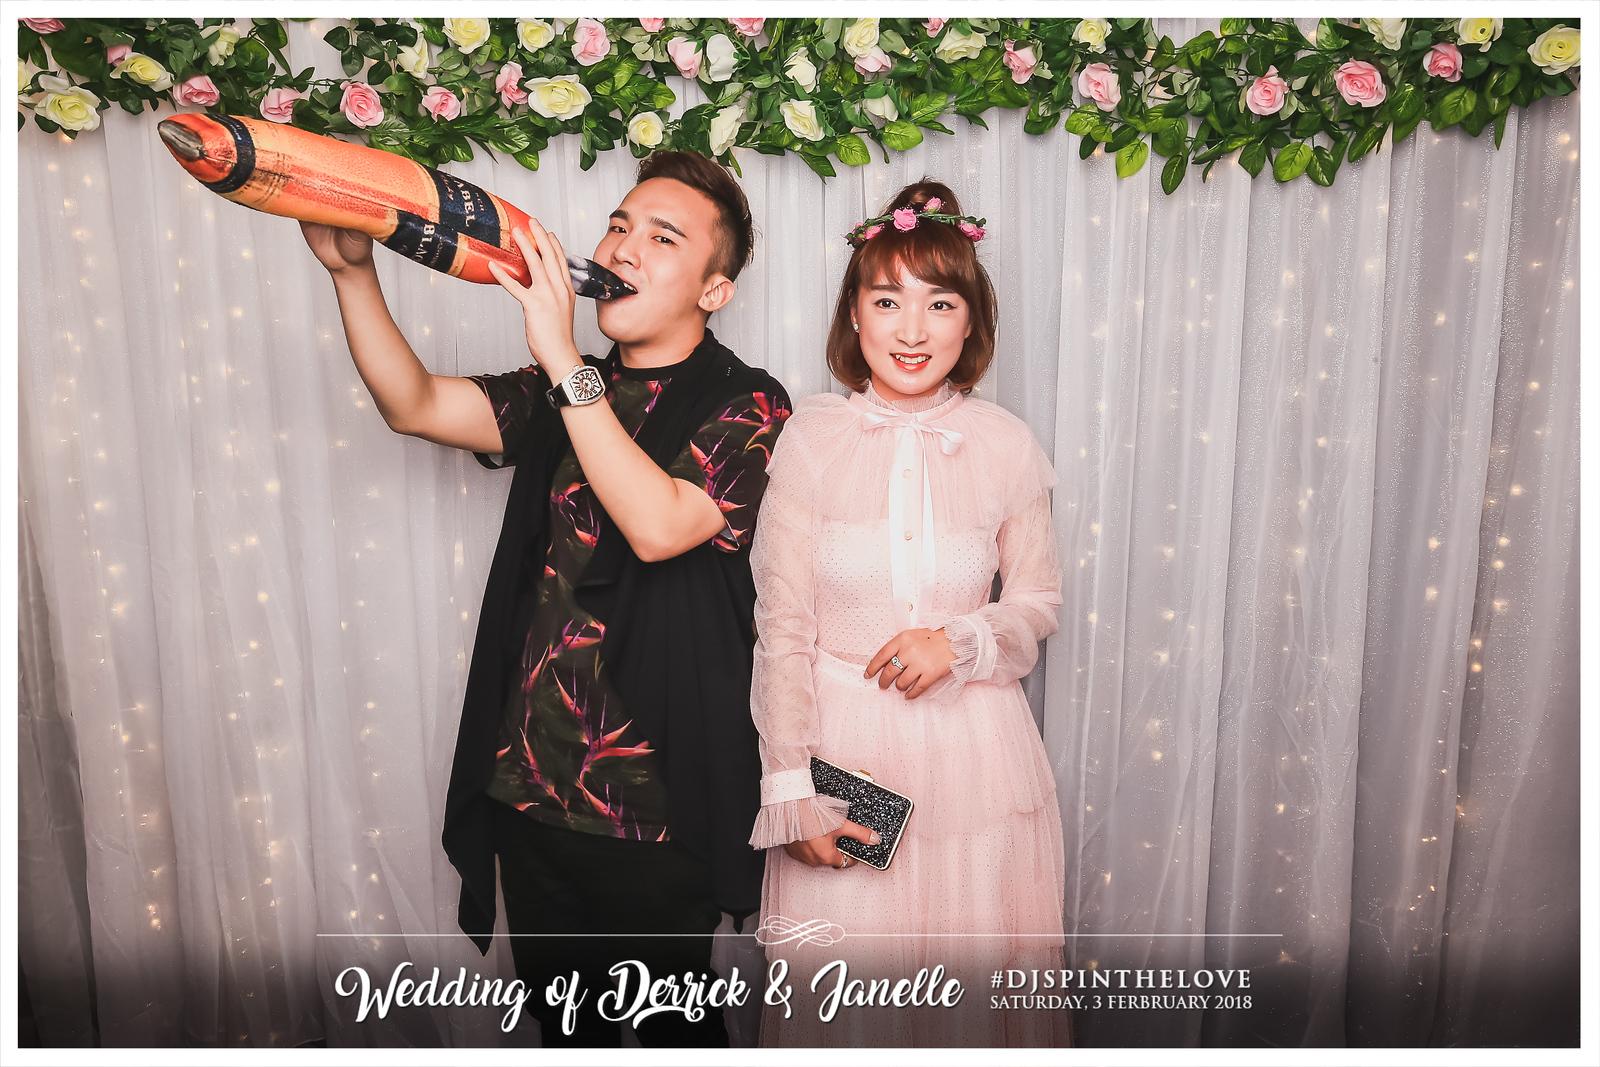 Wedding of Derrick & Janelle | © SRSLYPhotobooth.sg